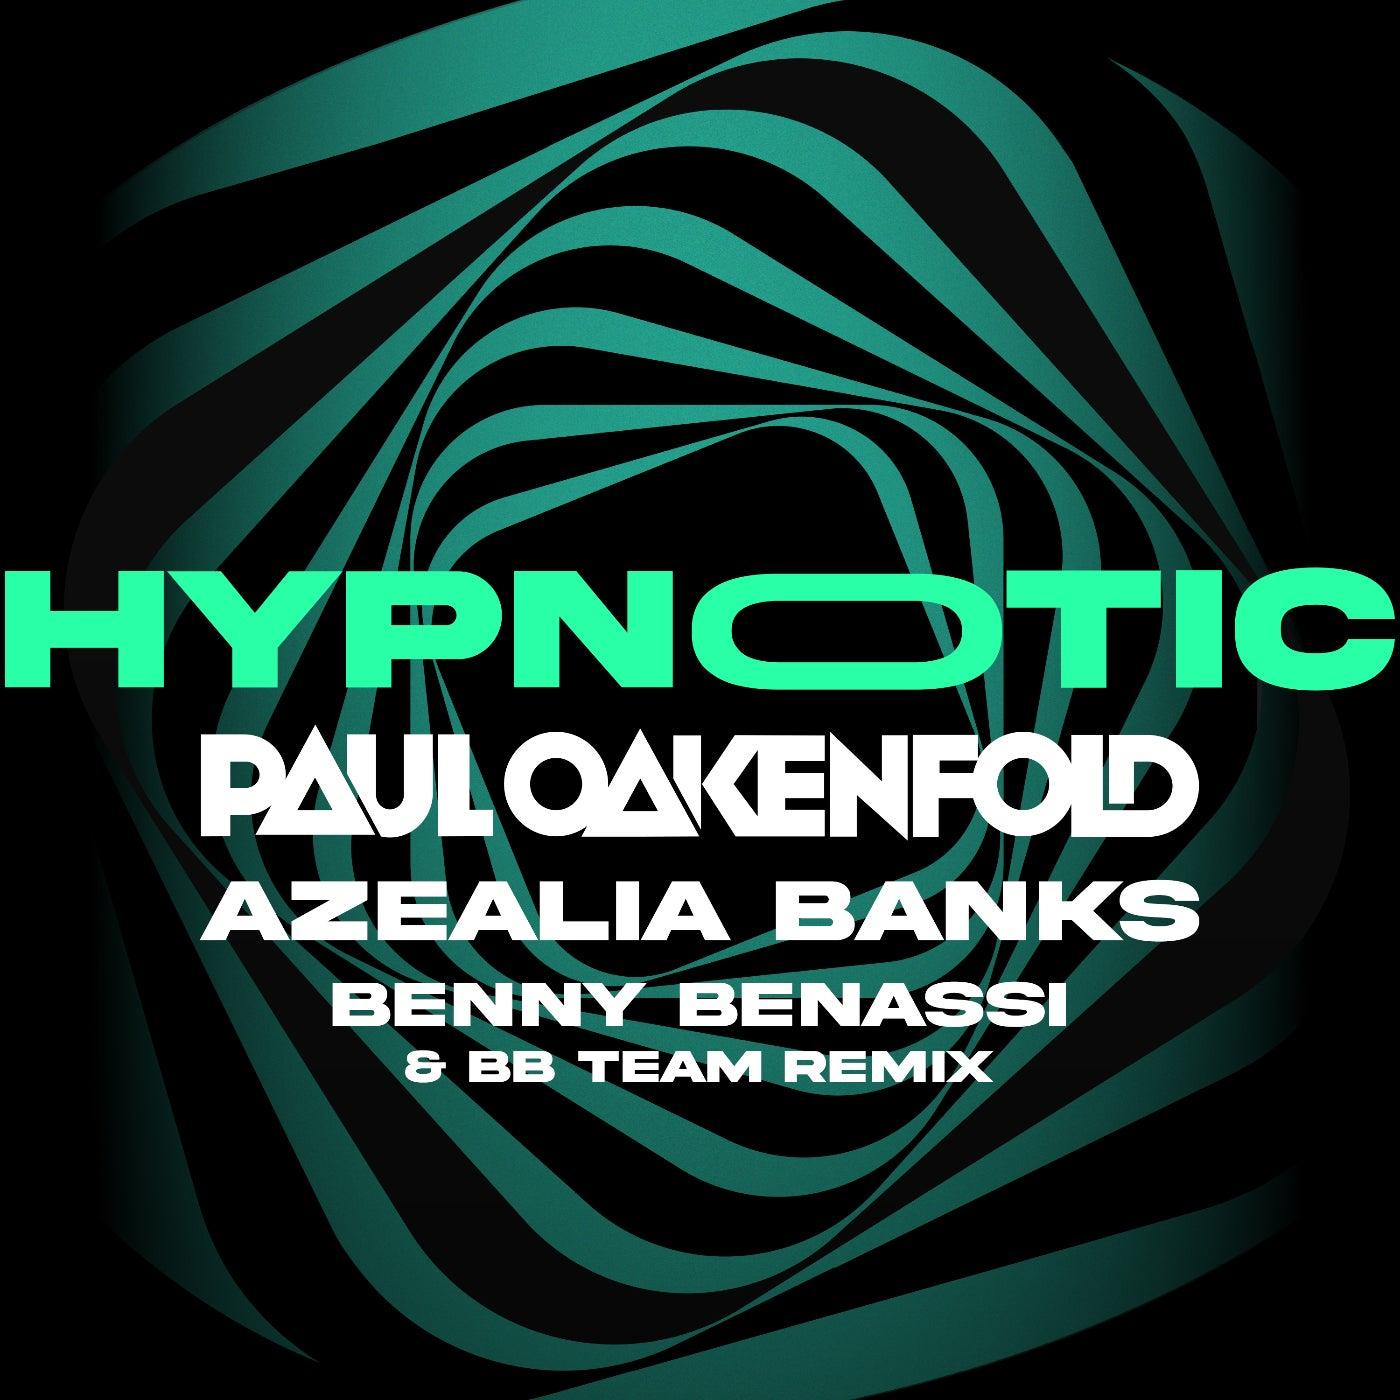 Hypnotic (Benny Benassi & BB Team Extended Remix)